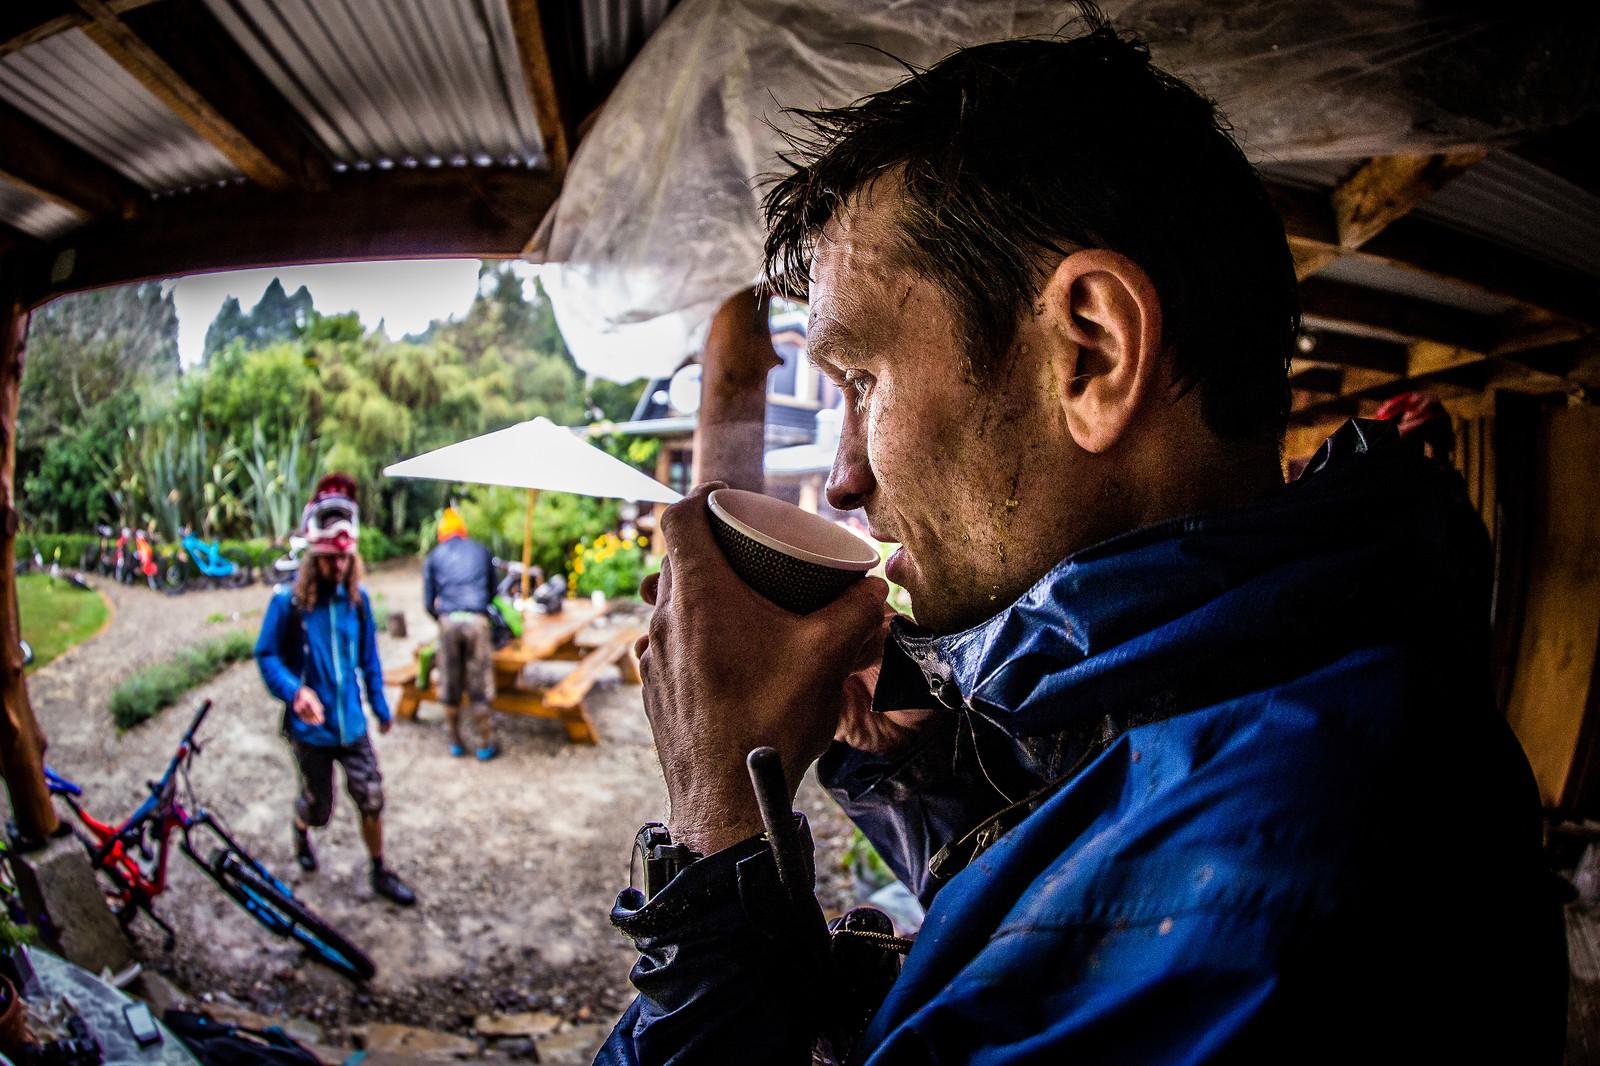 Tea and Coffee - NZ Enduro Day 2 - Mountain Biking Pictures - Vital MTB